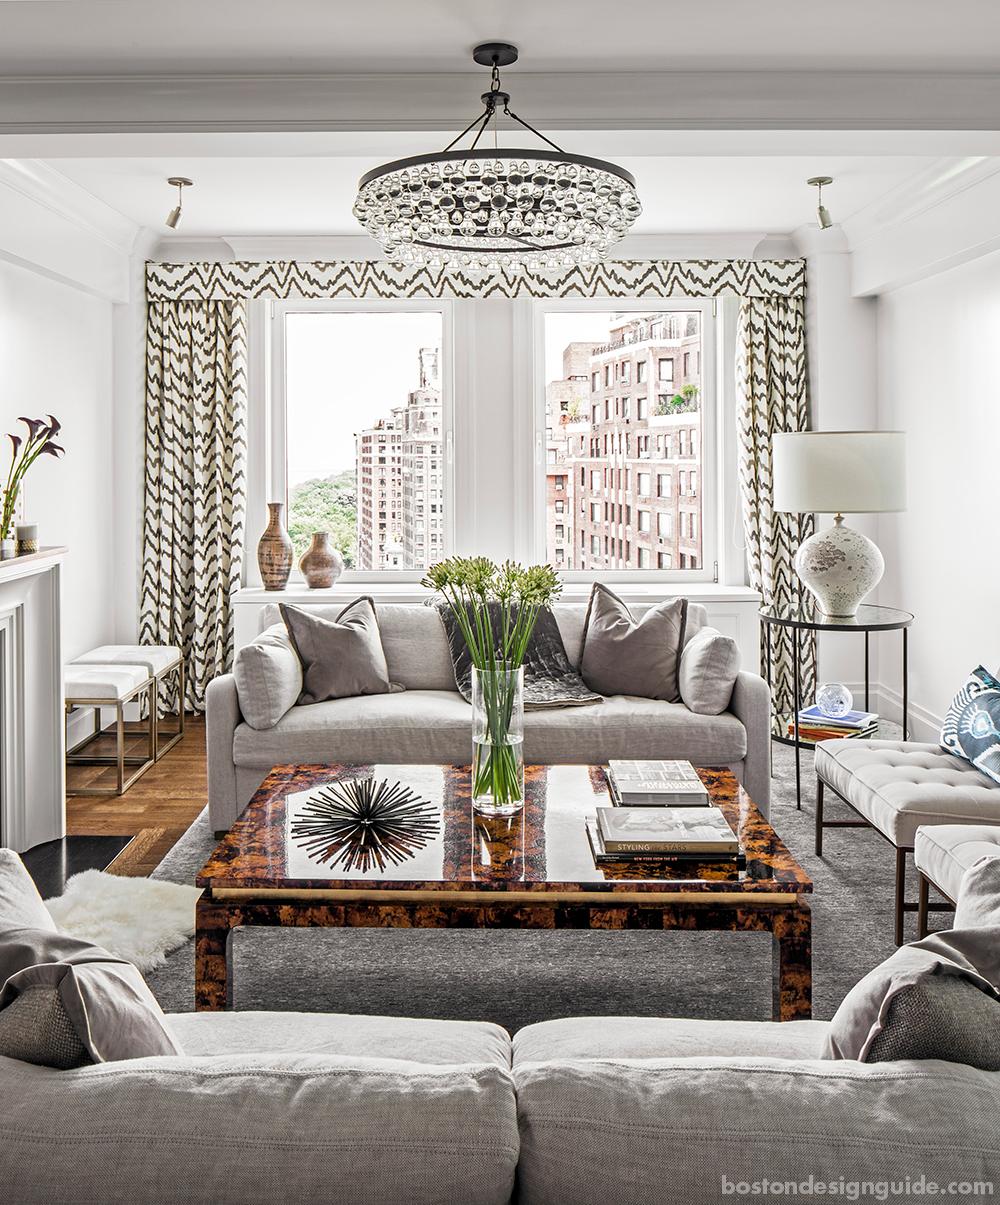 New York City glamorous apartments